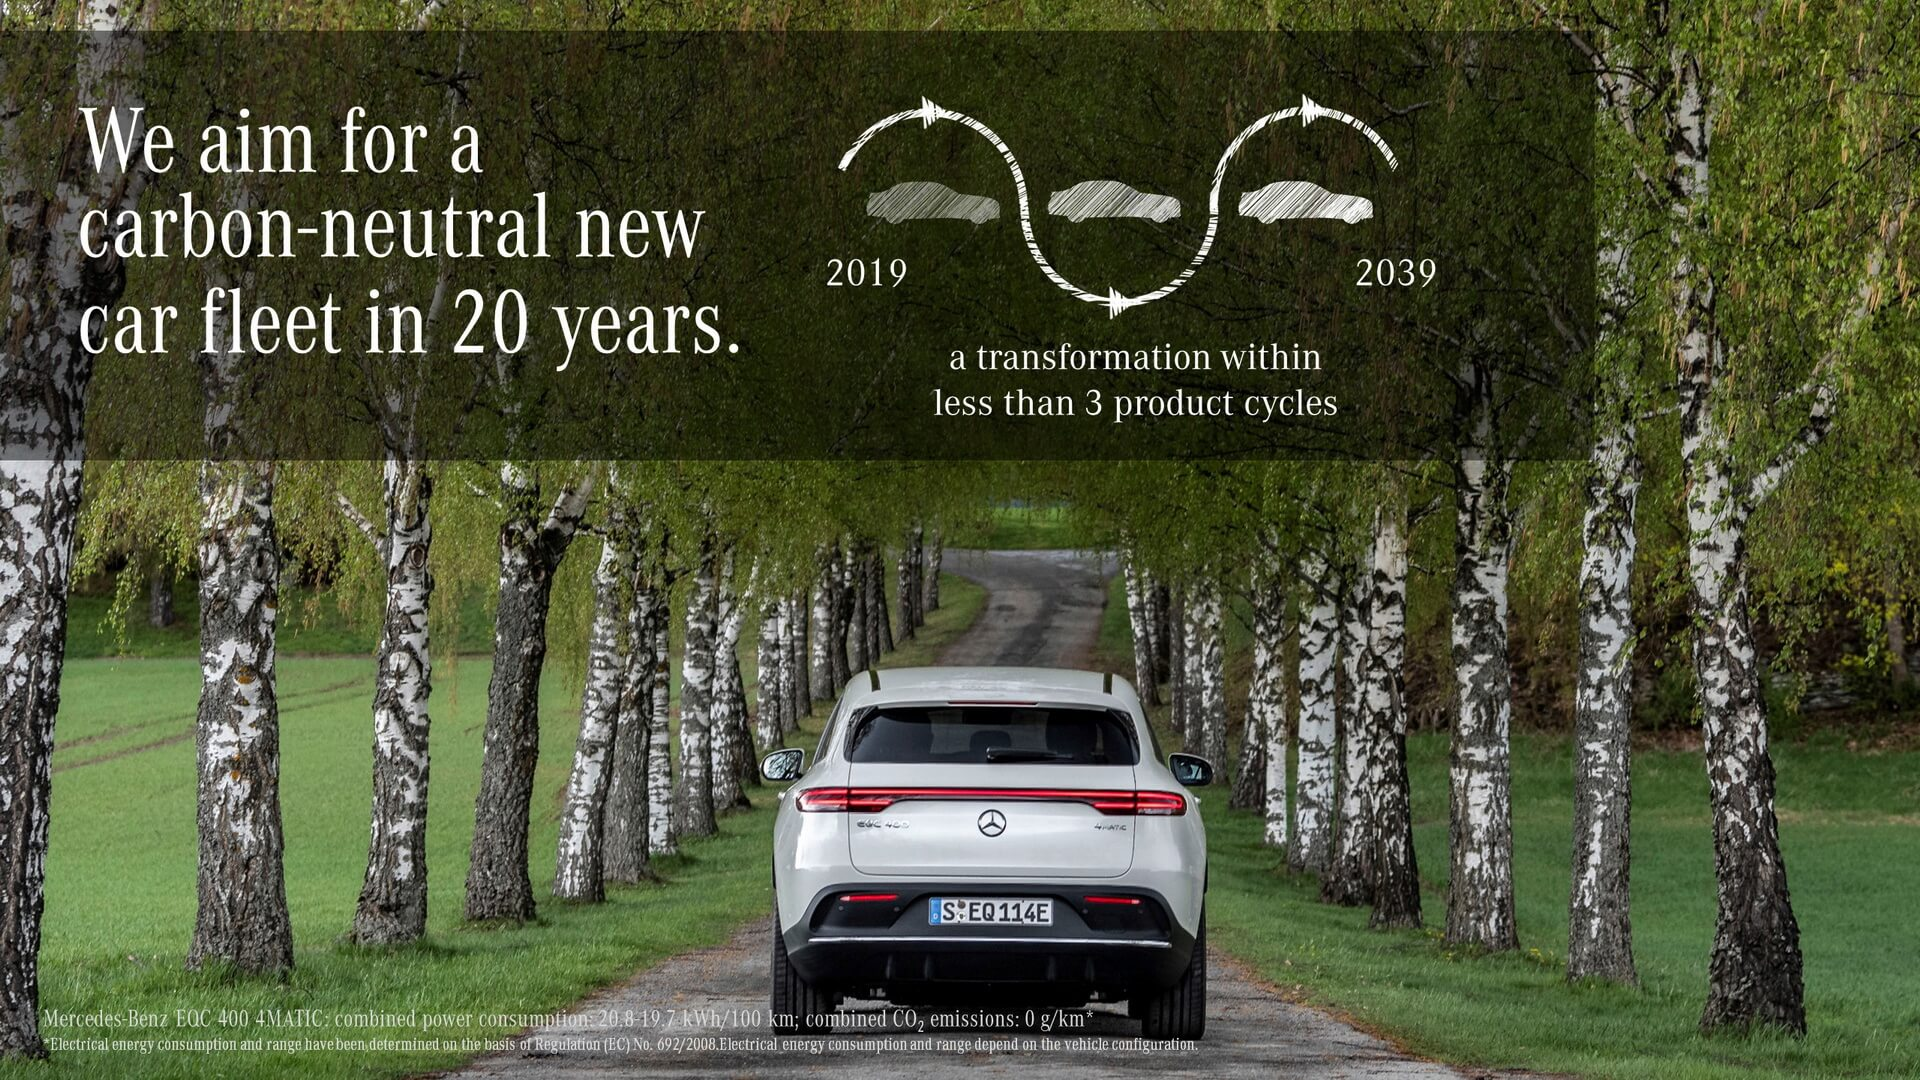 Mercedes-Benz представил экологическую доктрину Ambition 2039